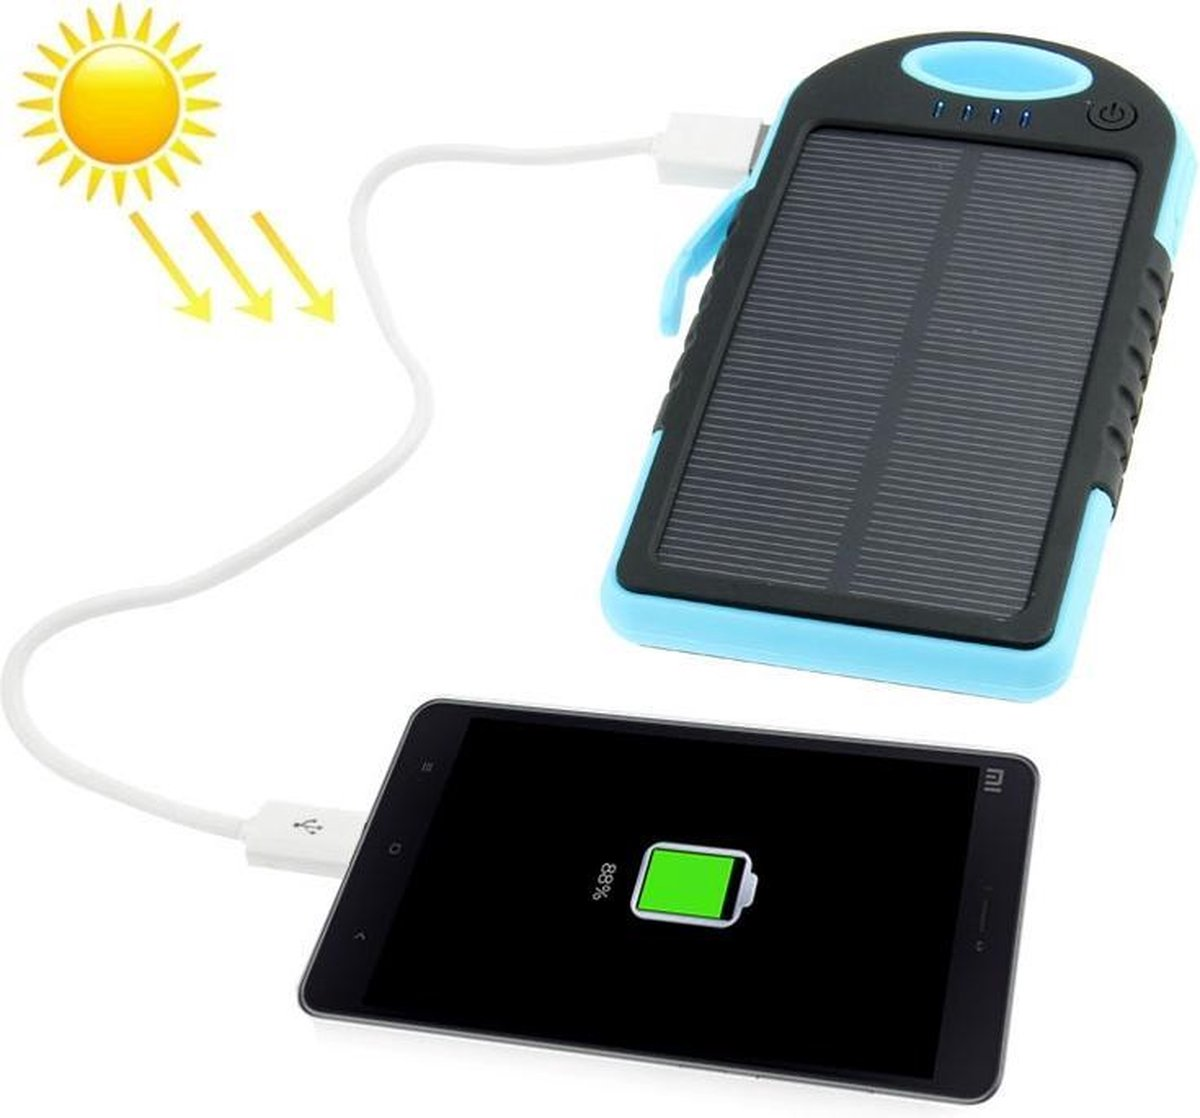 5000mAh spatwaterdicht / schokbestendig / Dropproof Emergency Power Solar Charger voor iPhone / Galaxy / Sony / HTC / LG (groen)